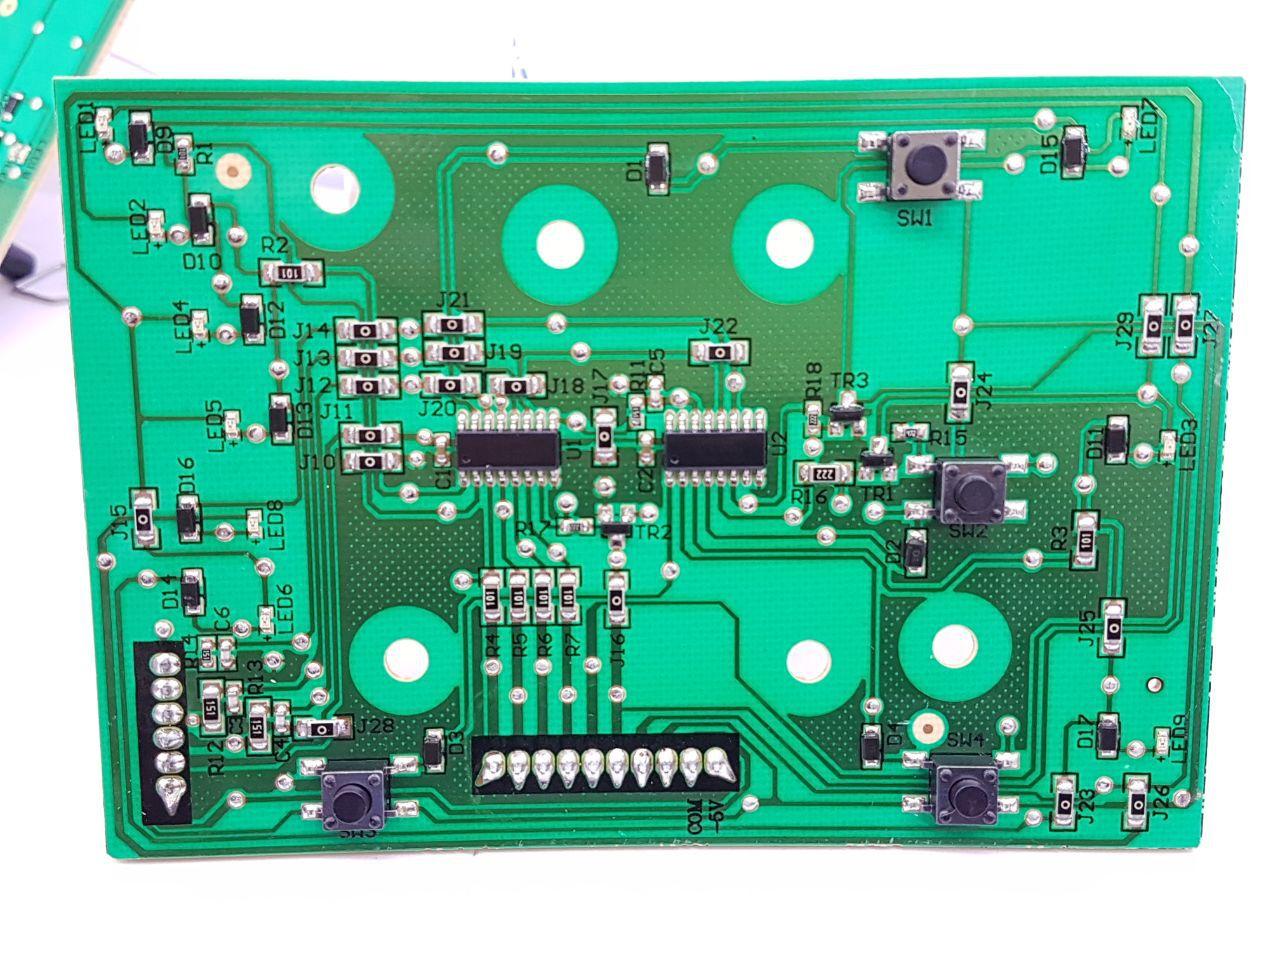 Placa Interface Pressostato Electrolux Orig. La15f 64501512